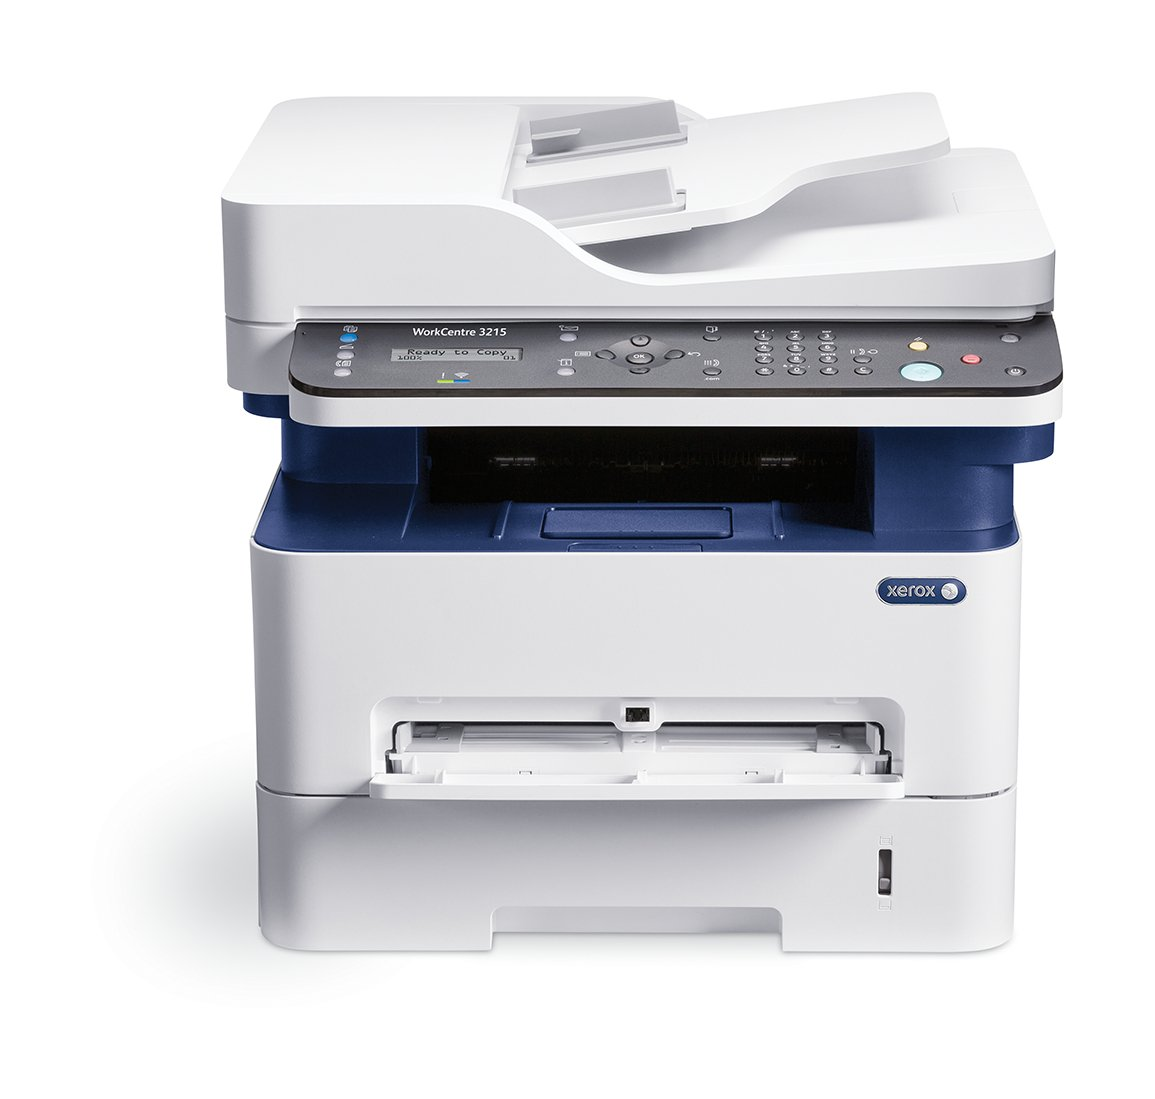 Xerox WorkCentre 3215/NI Monchrome Multifunction (All-in-One) Printer 80mm thermal printer new upgrade quality hprt lpq80 printers pos printer barcode printer